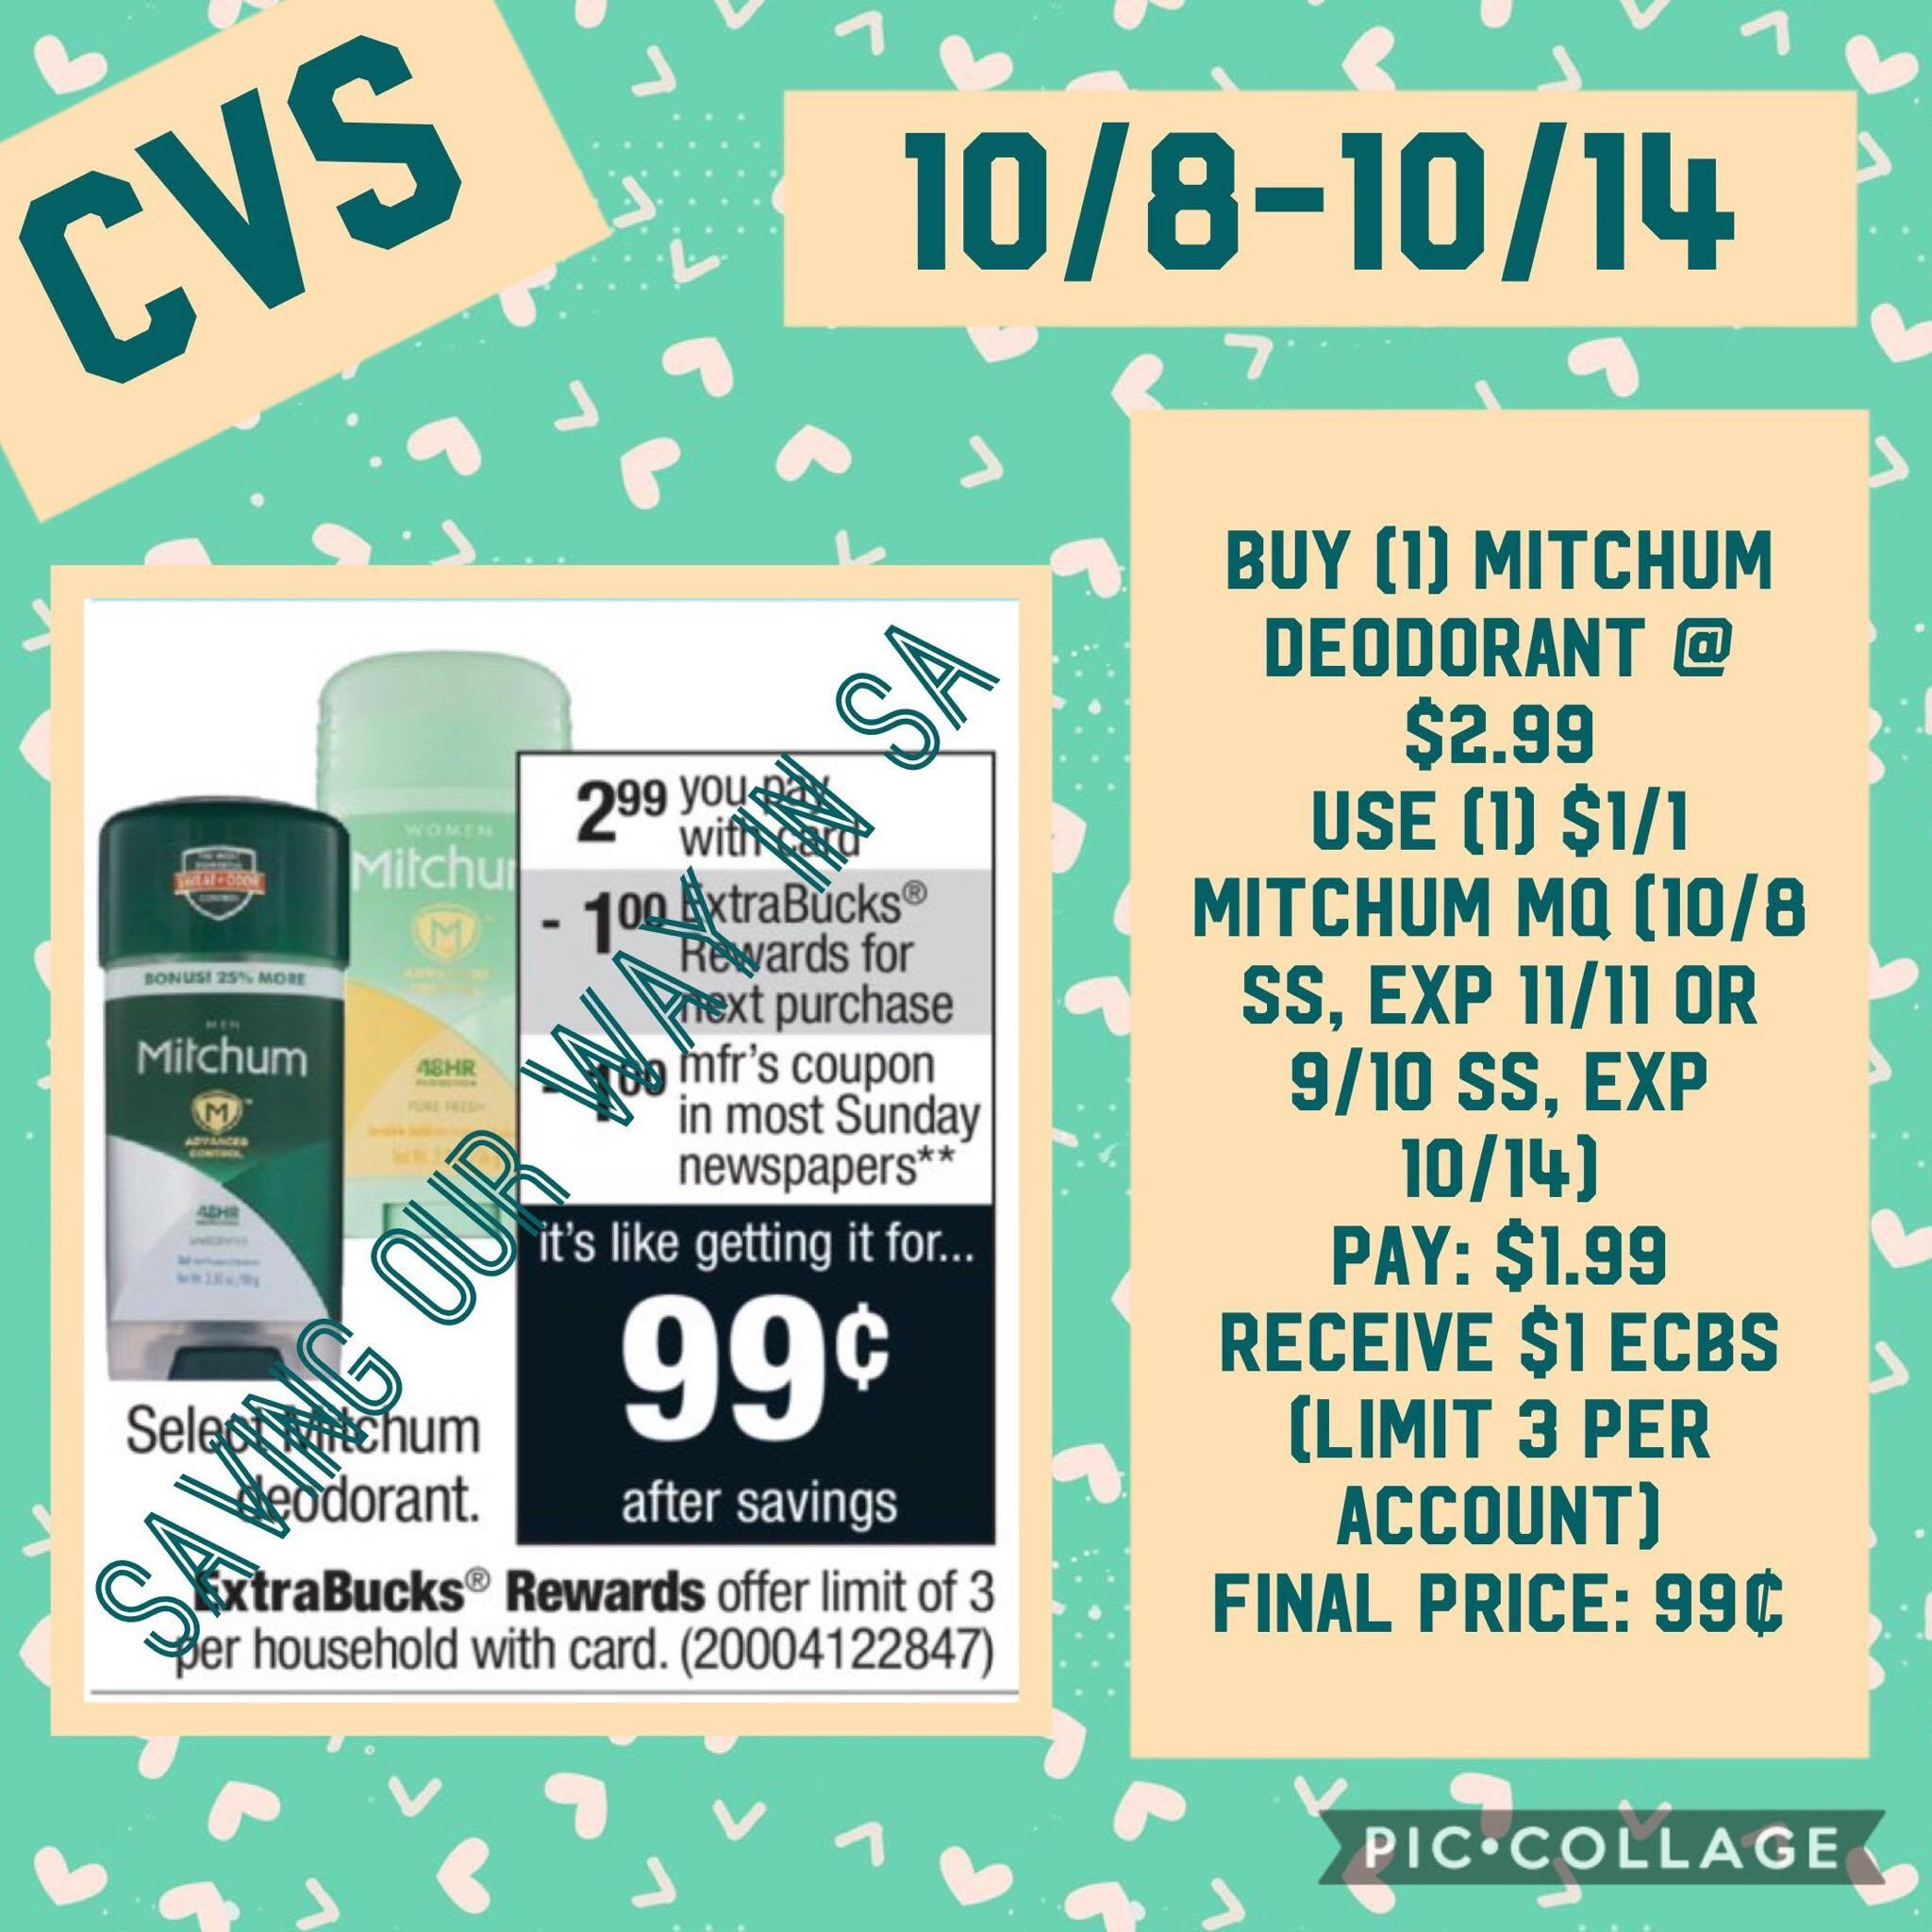 Mitchum Deodorant Just $0.99 @ Cvs! Week Of 10/8-10/14 | Couponing - Free Printable Coupons For Mitchum Deodorant